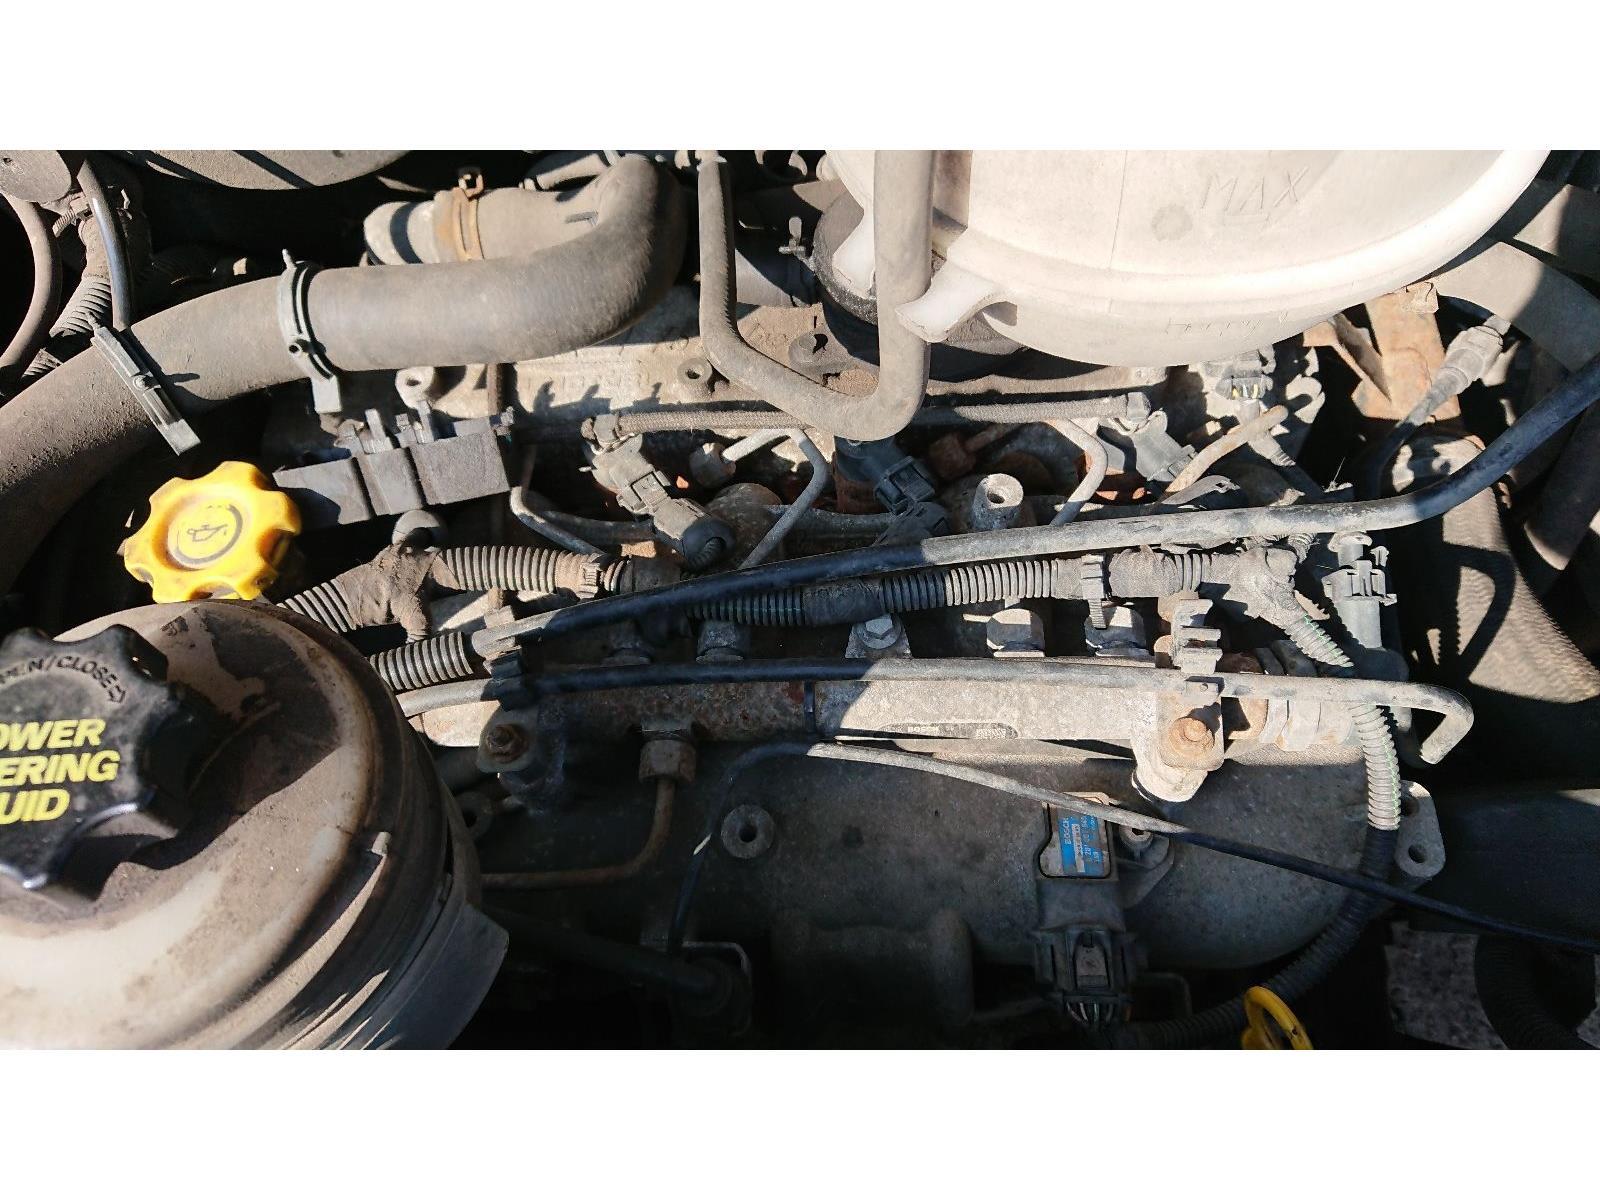 ENGINE LDV Maxus 08 On 2.5 120Bhp Diesel VMR425 (R2516L) & WARRANTY -  7380191